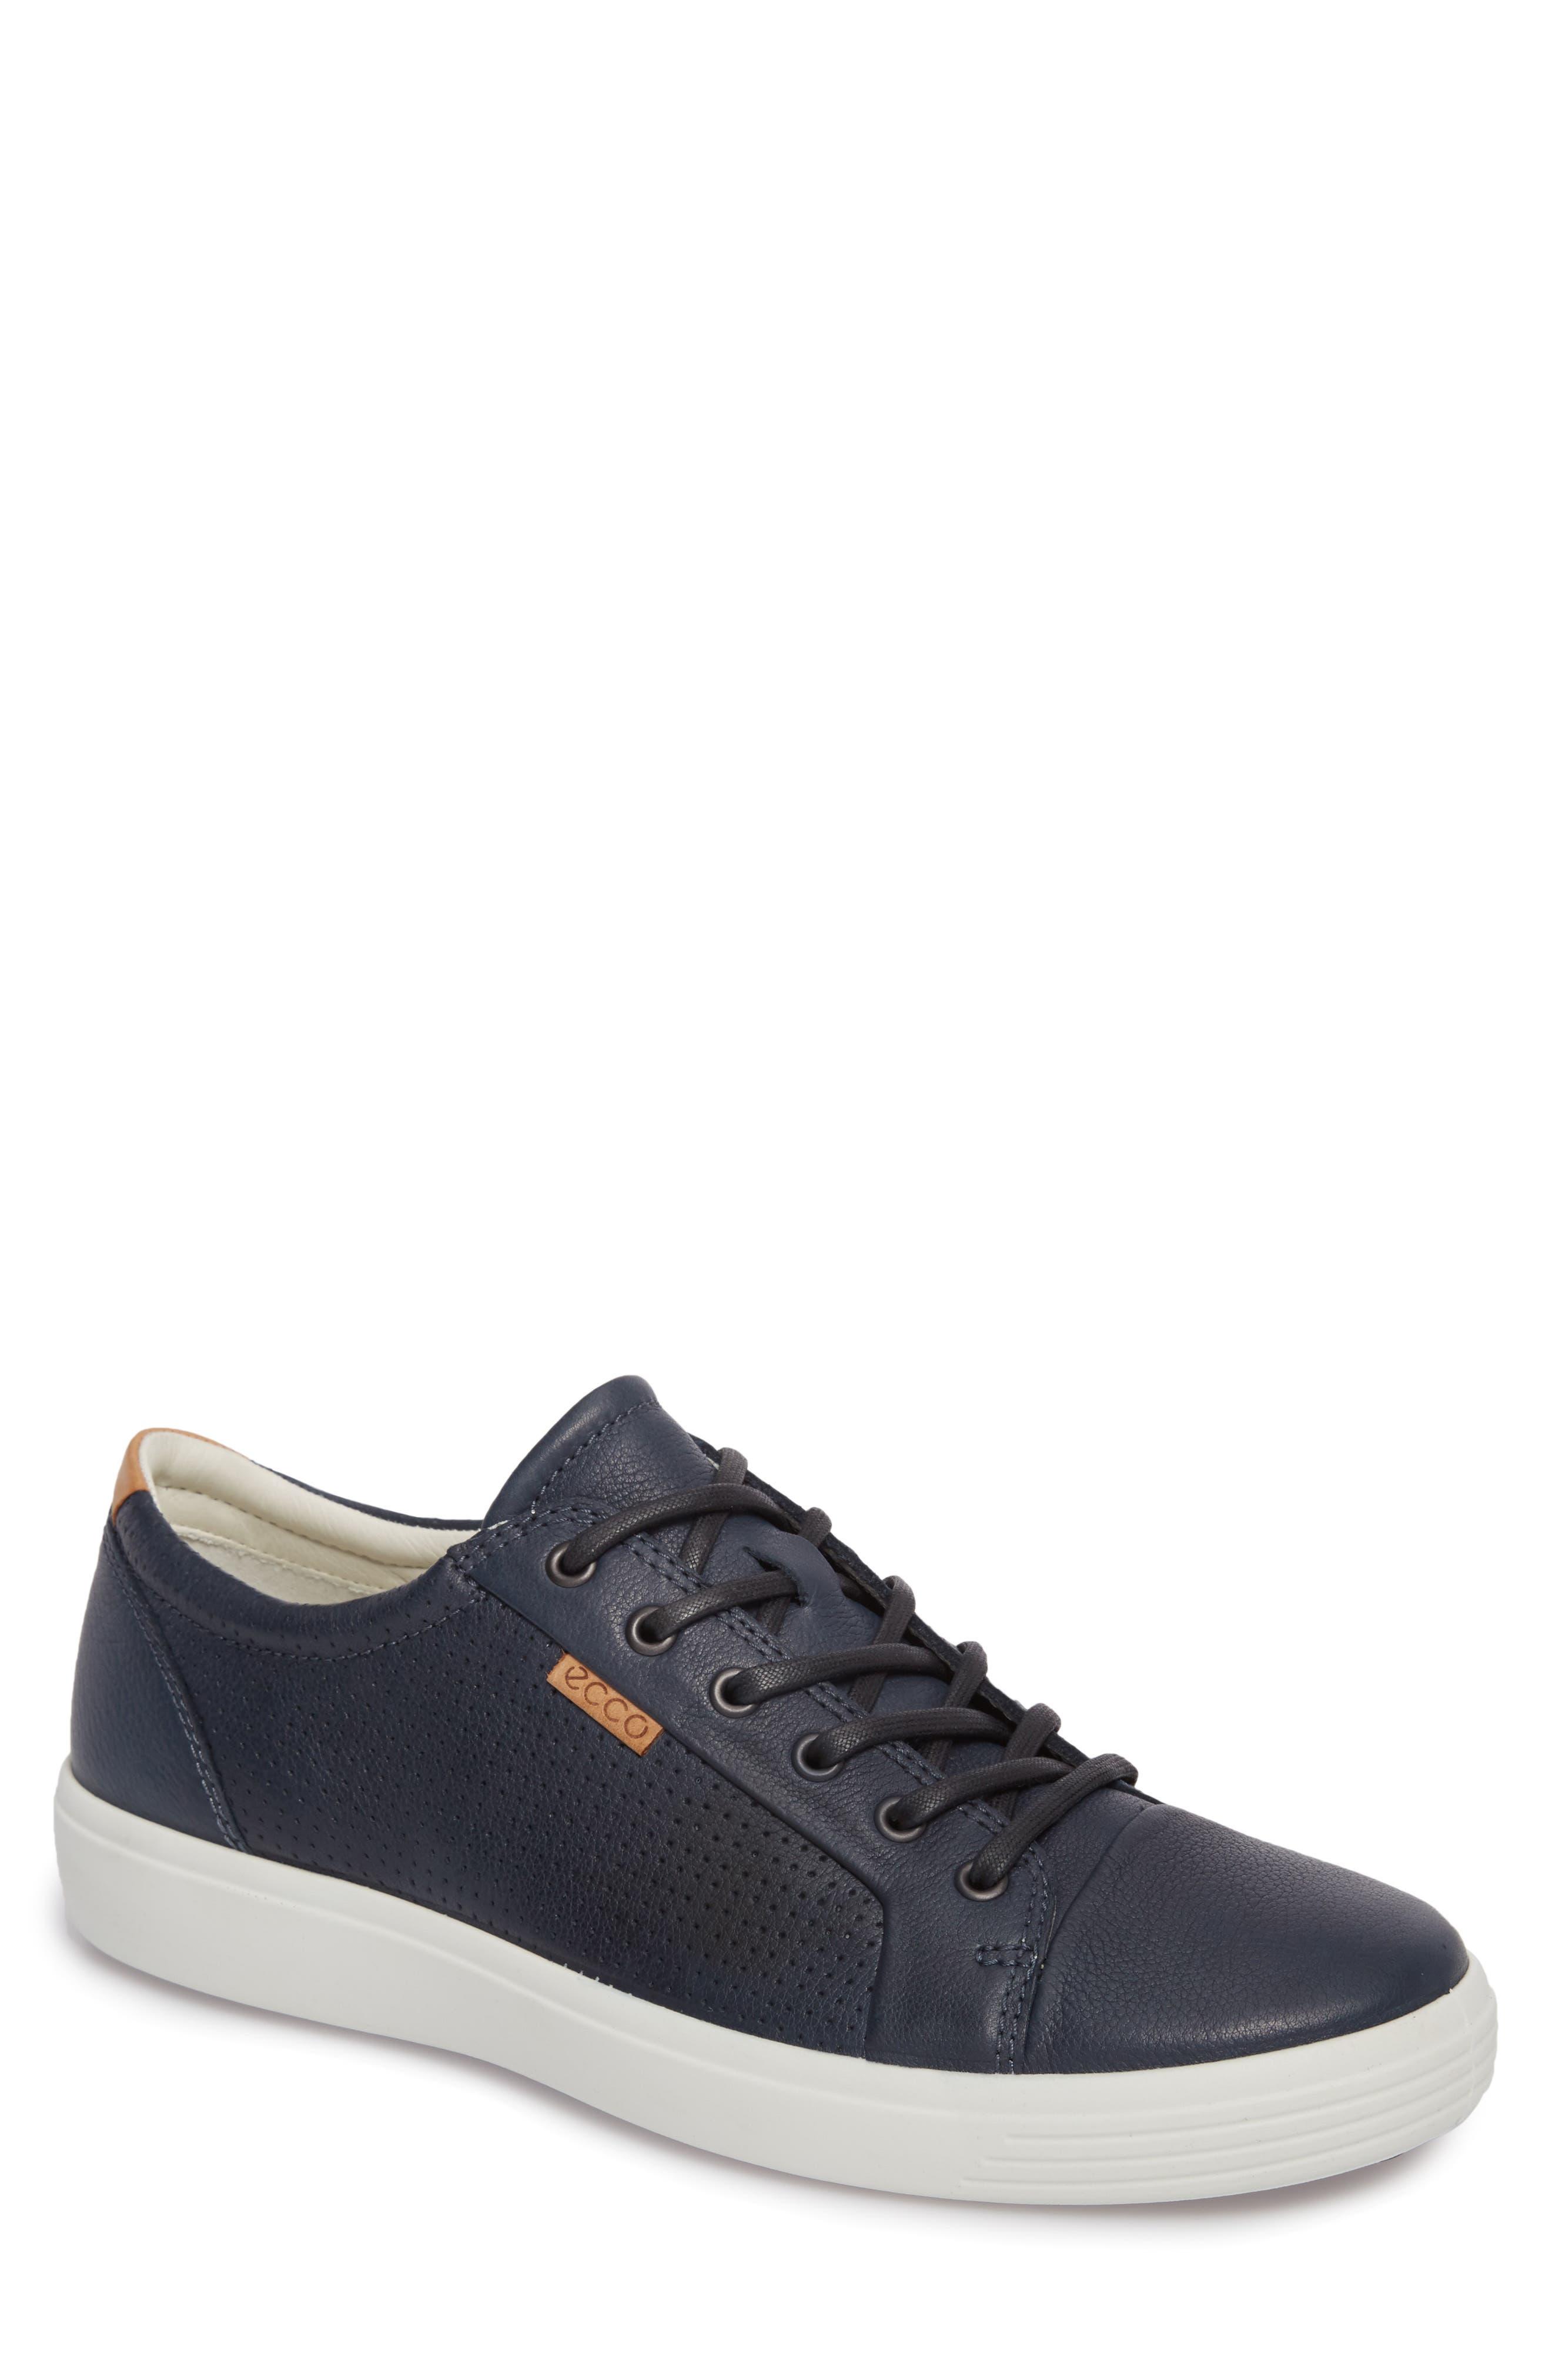 Alternate Image 1 Selected - ECCO 'Soft 7' Sneaker (Men)